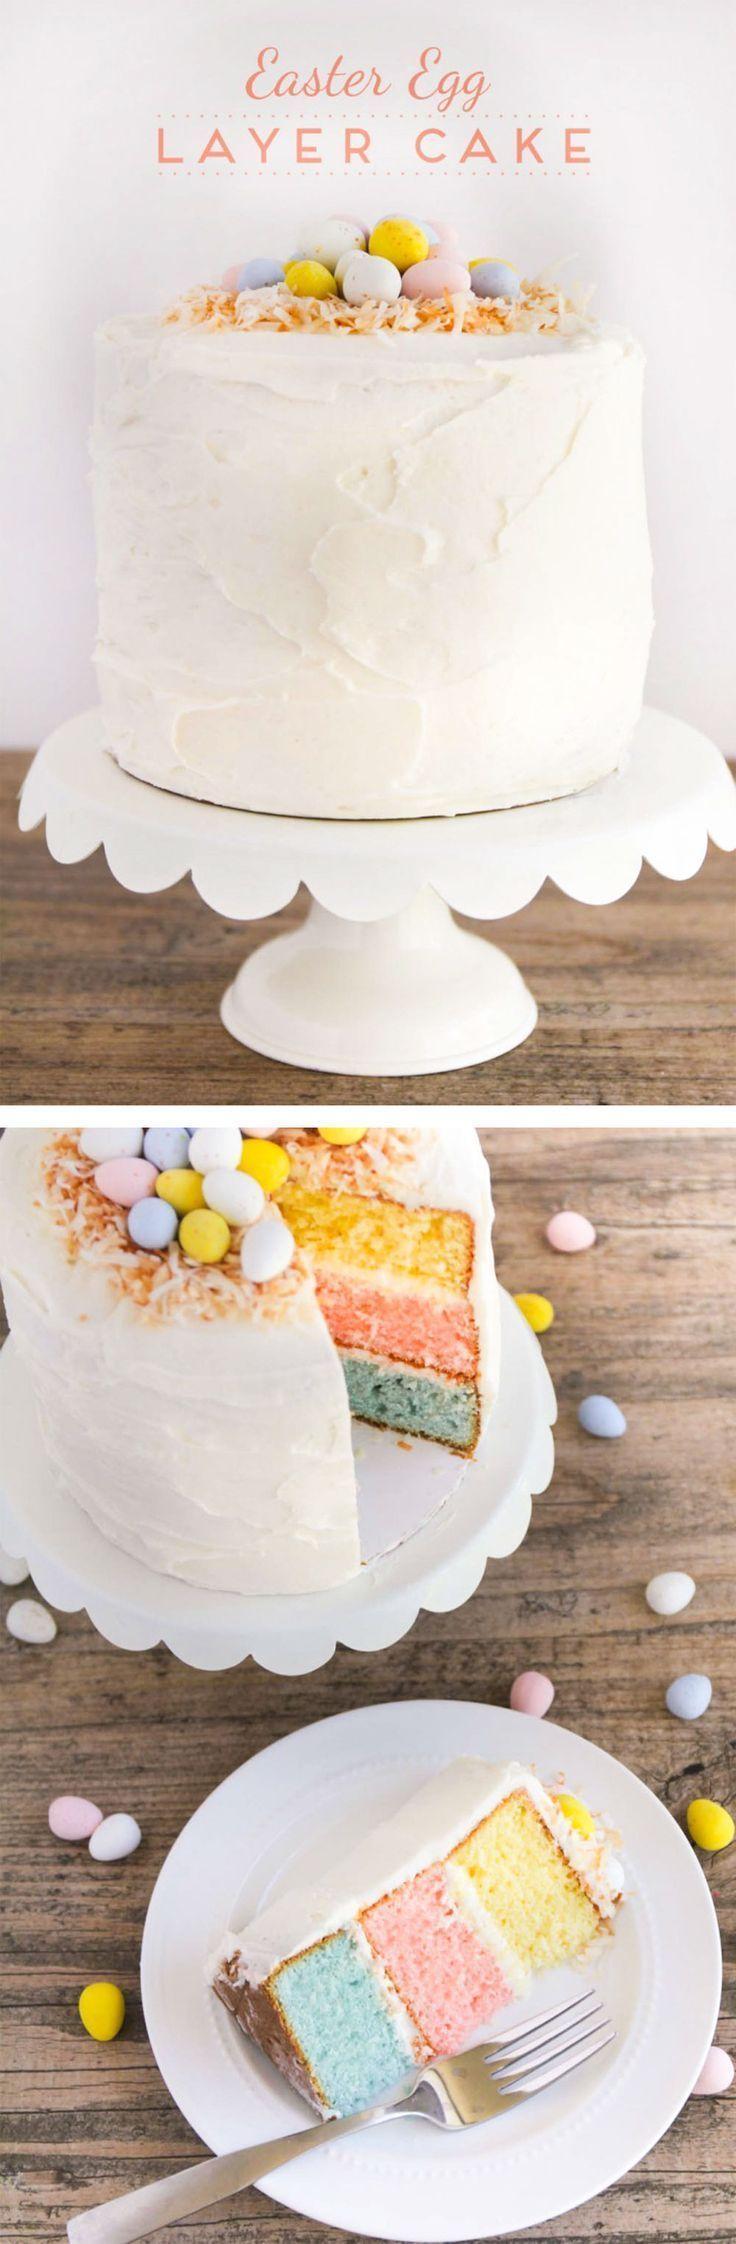 Best 25+ Easter cake ideas on Pinterest | Easter bunny cake, Happy ...